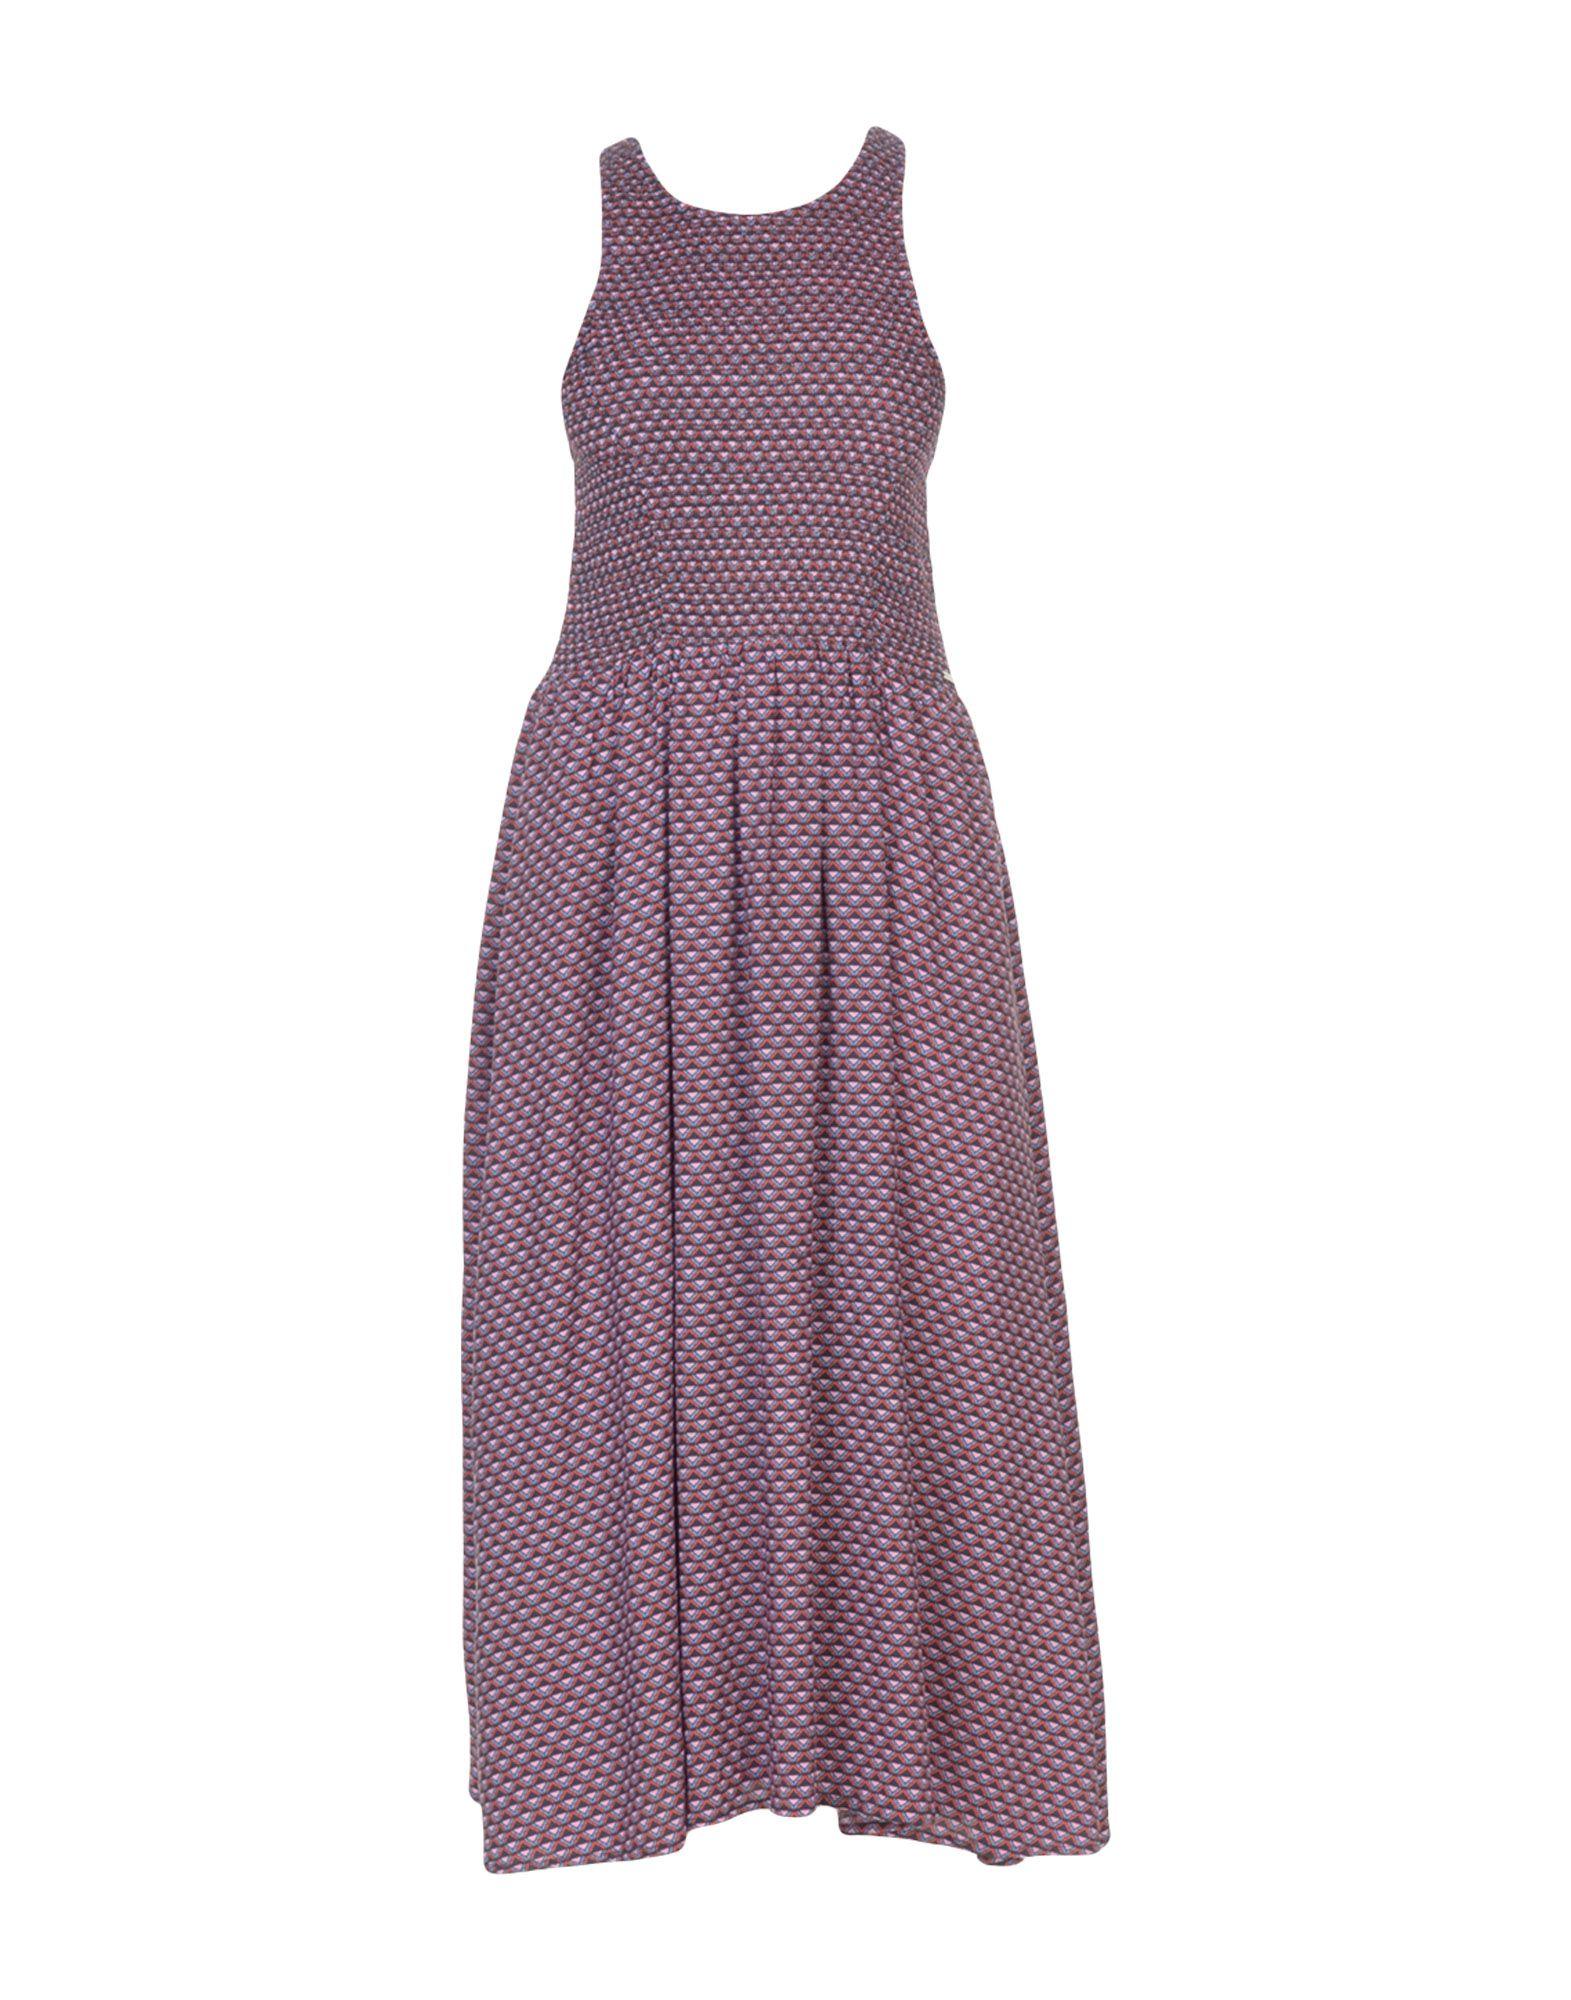 PEPE JEANS Платье длиной 3/4 pepe jeans платье pepe jeans pl951690 0aa